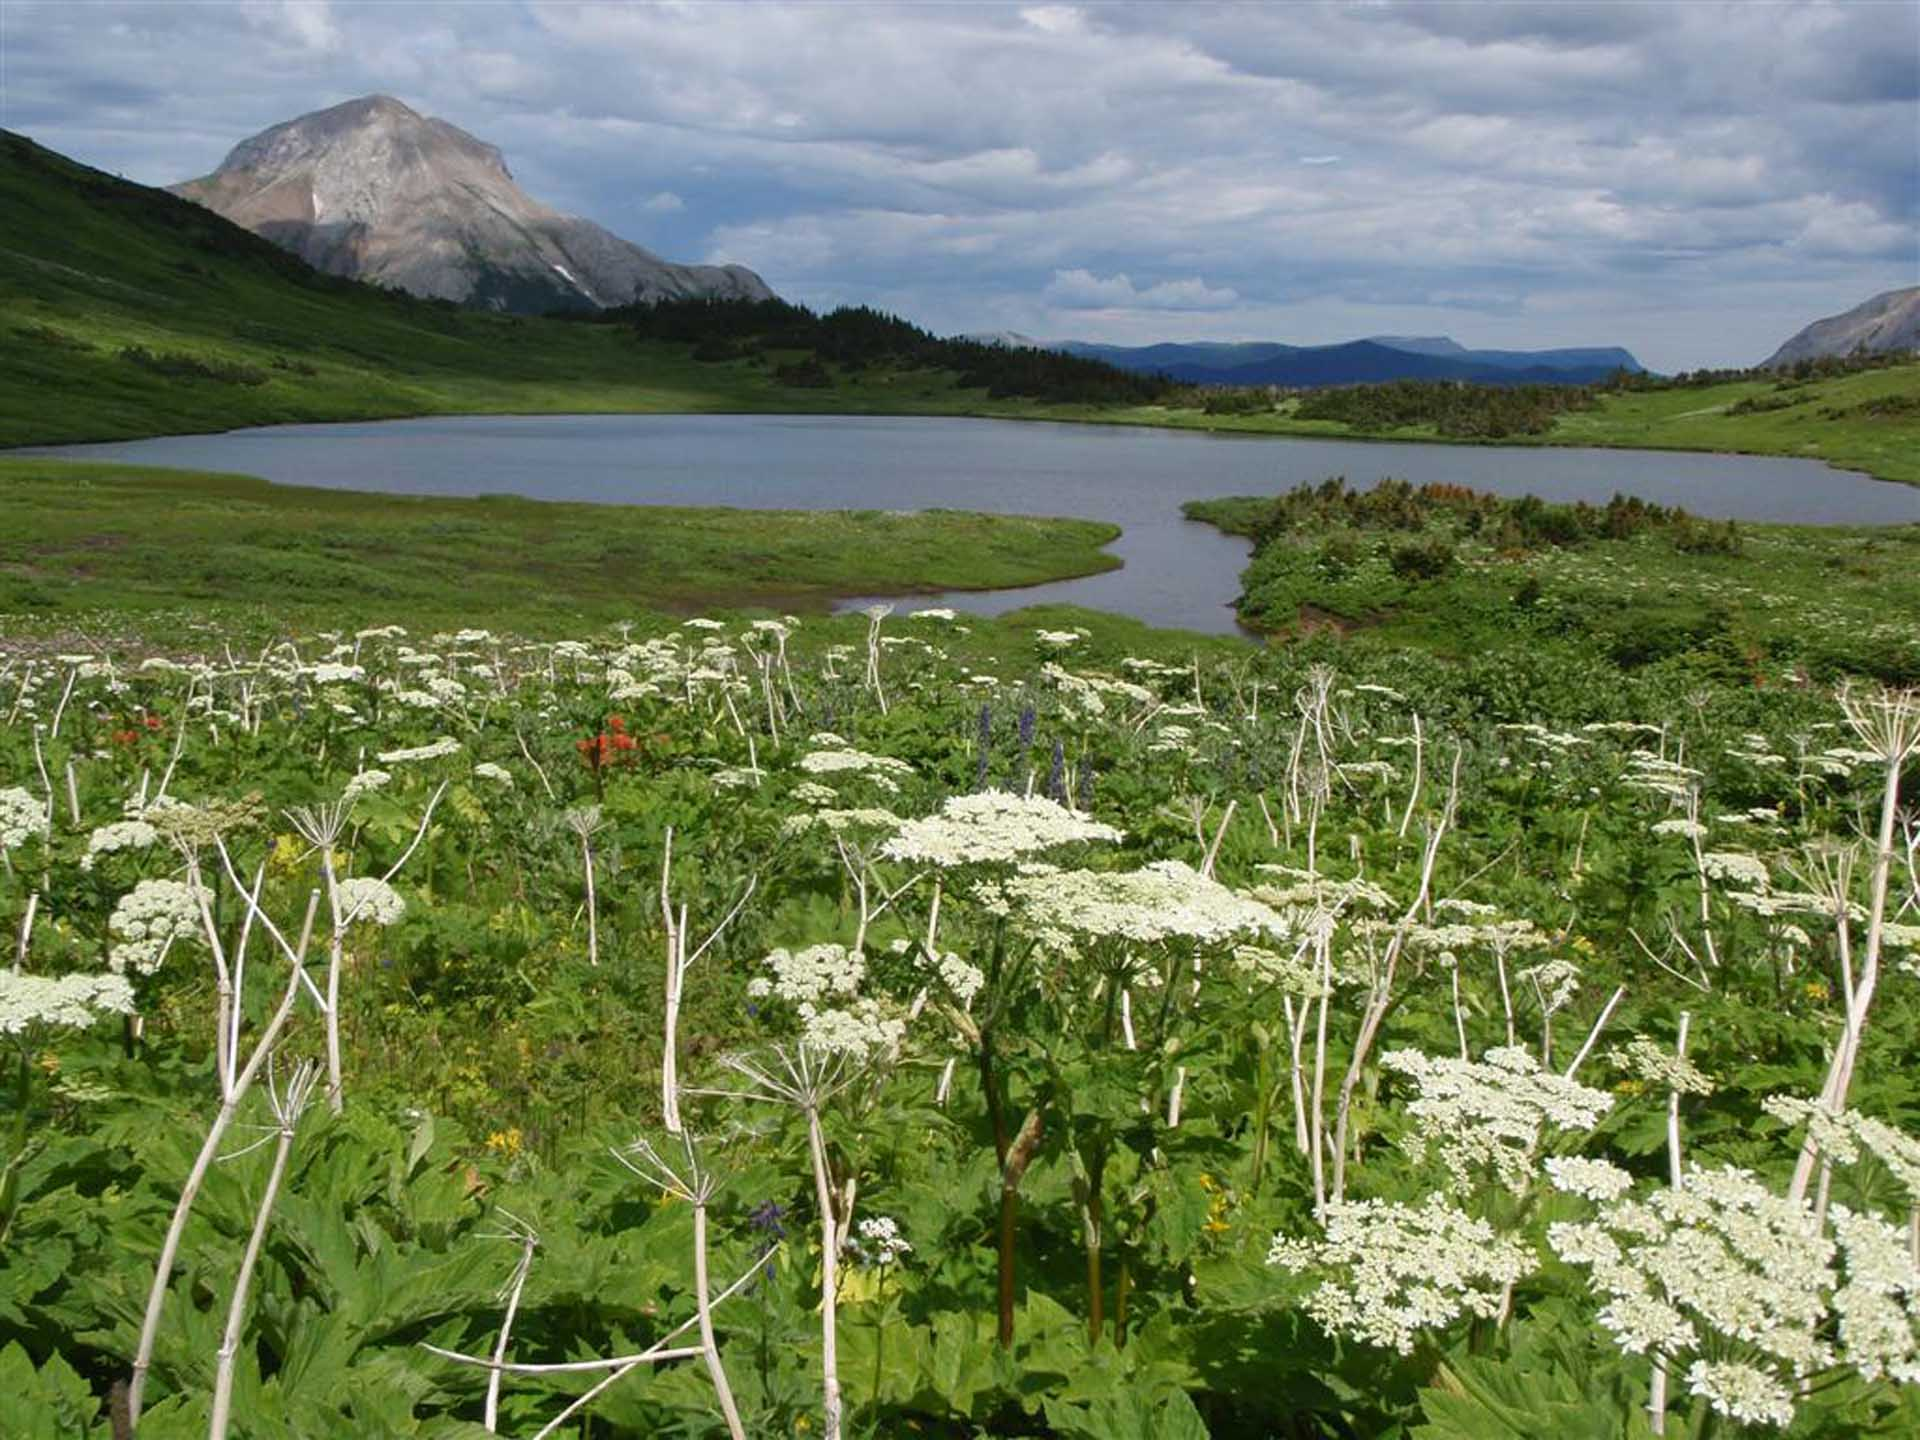 Alpine Flower at Windfall Lake